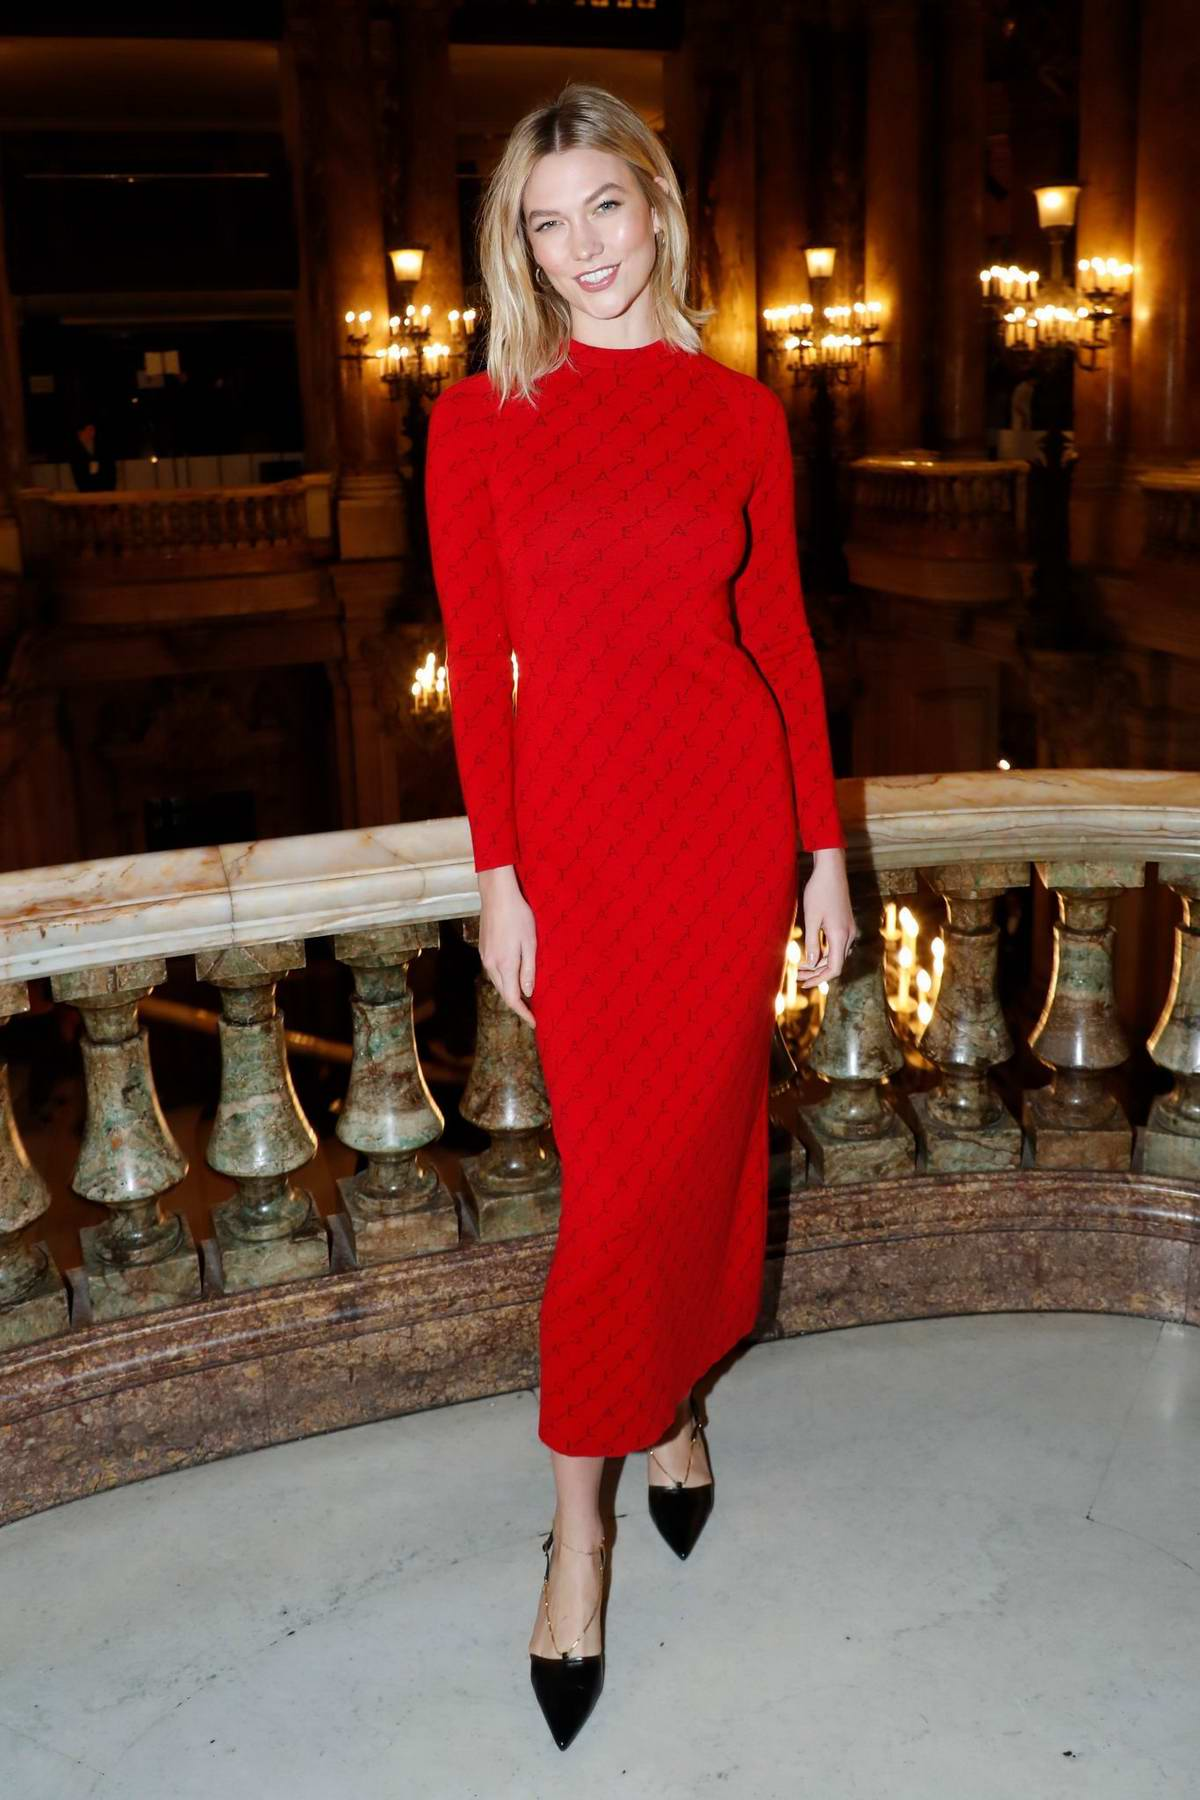 efeaeaee48180 Karlie Kloss attends the Stella McCartney show during Paris Fashion Week  Womenswear F/W 2019/20 in Paris, France